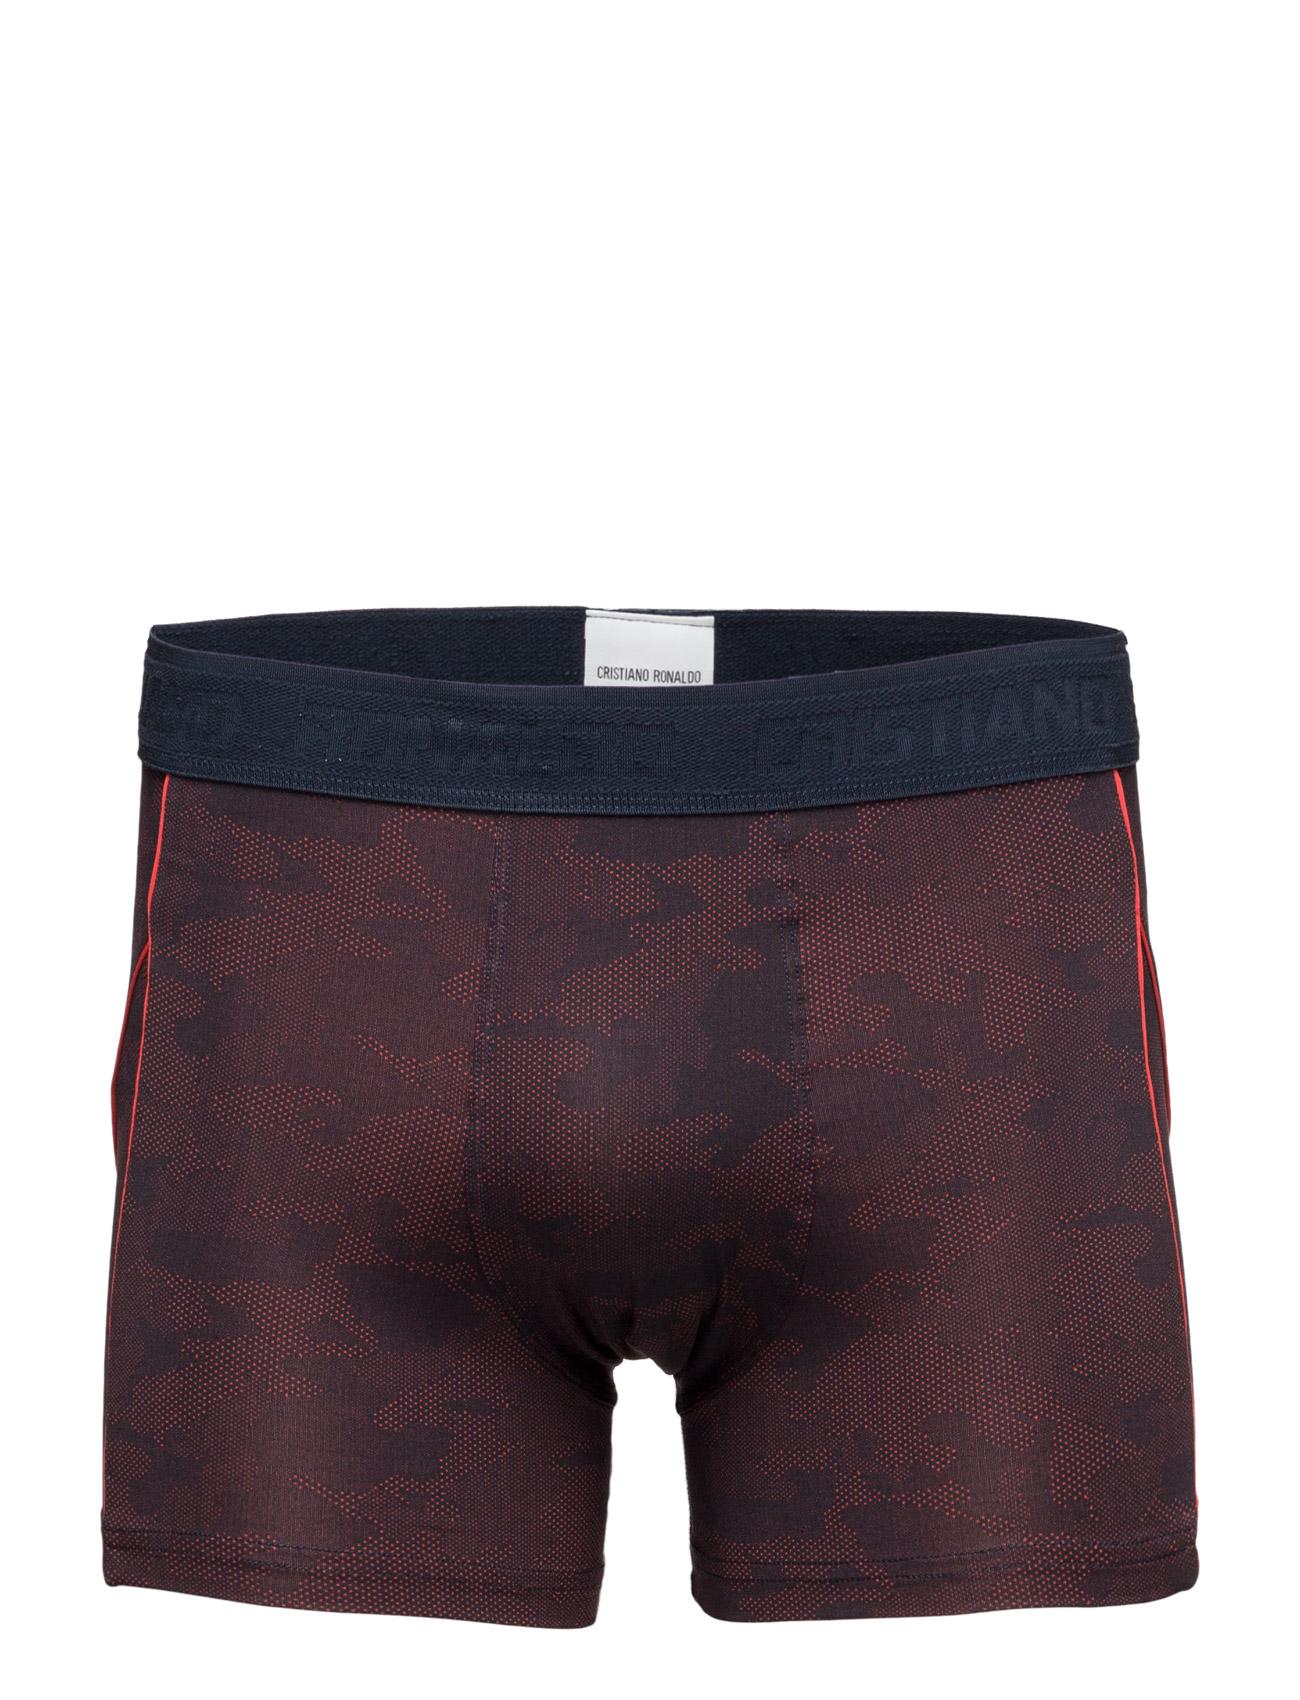 Cr7 Fashion, Trunk  Athletic CR7 Boxershorts